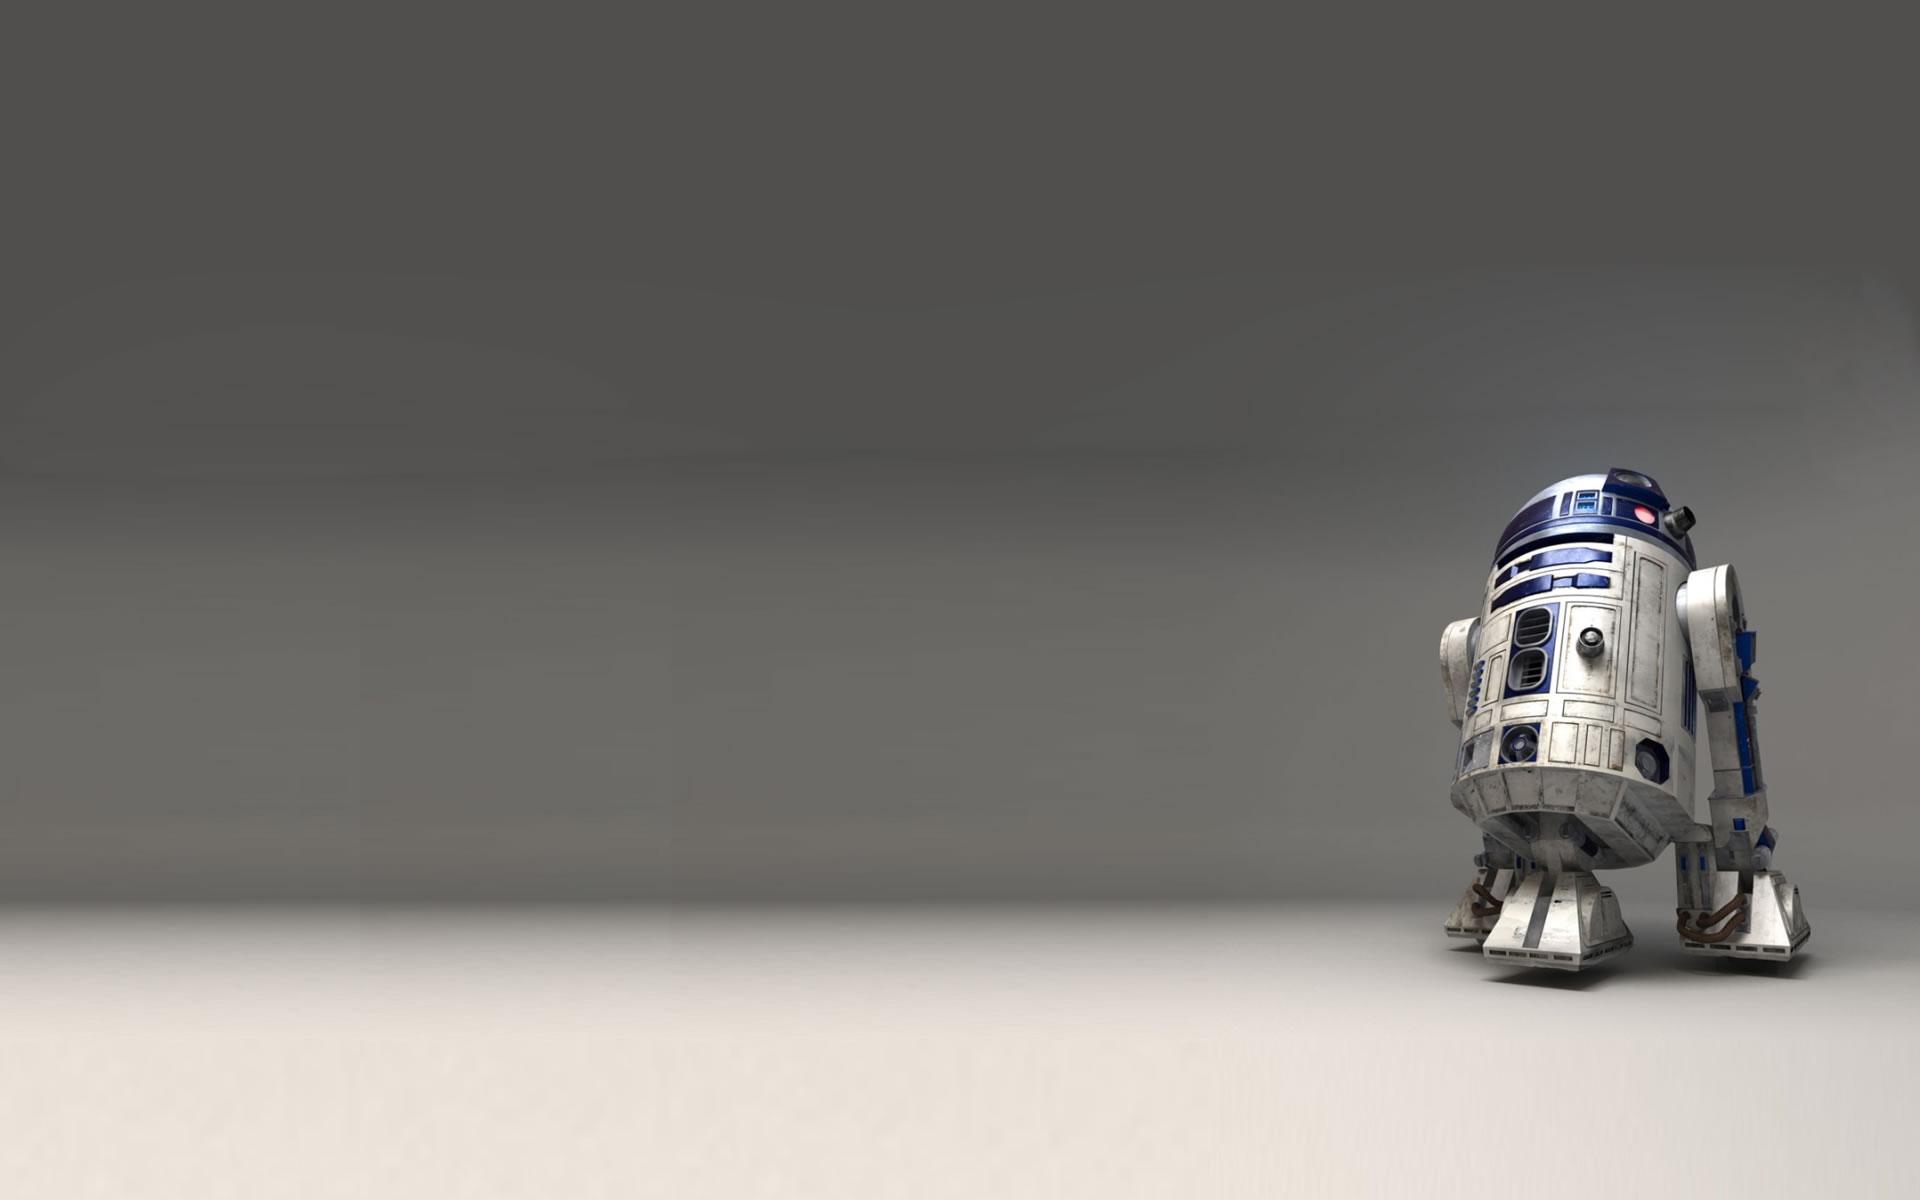 R2D2 Star Wars Wallpaper